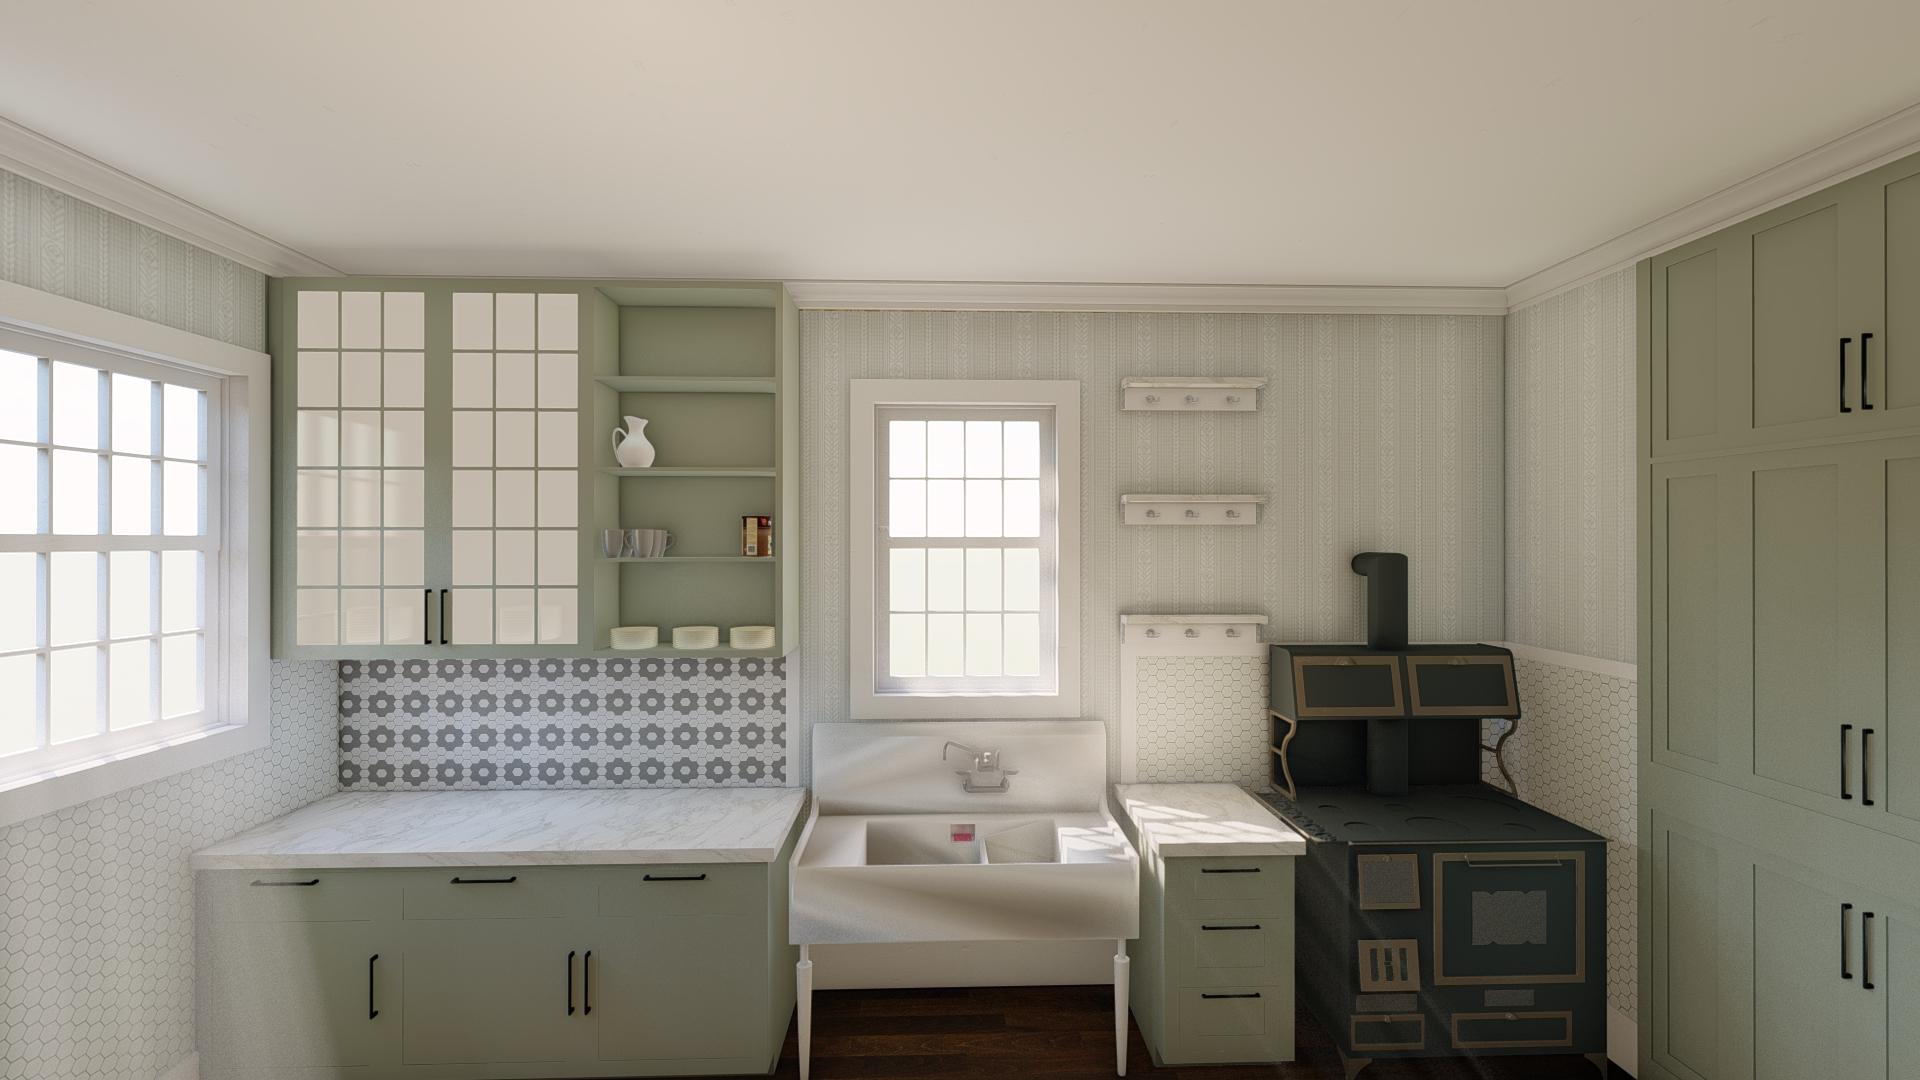 Chigley Interior_1 - Photo.jpg